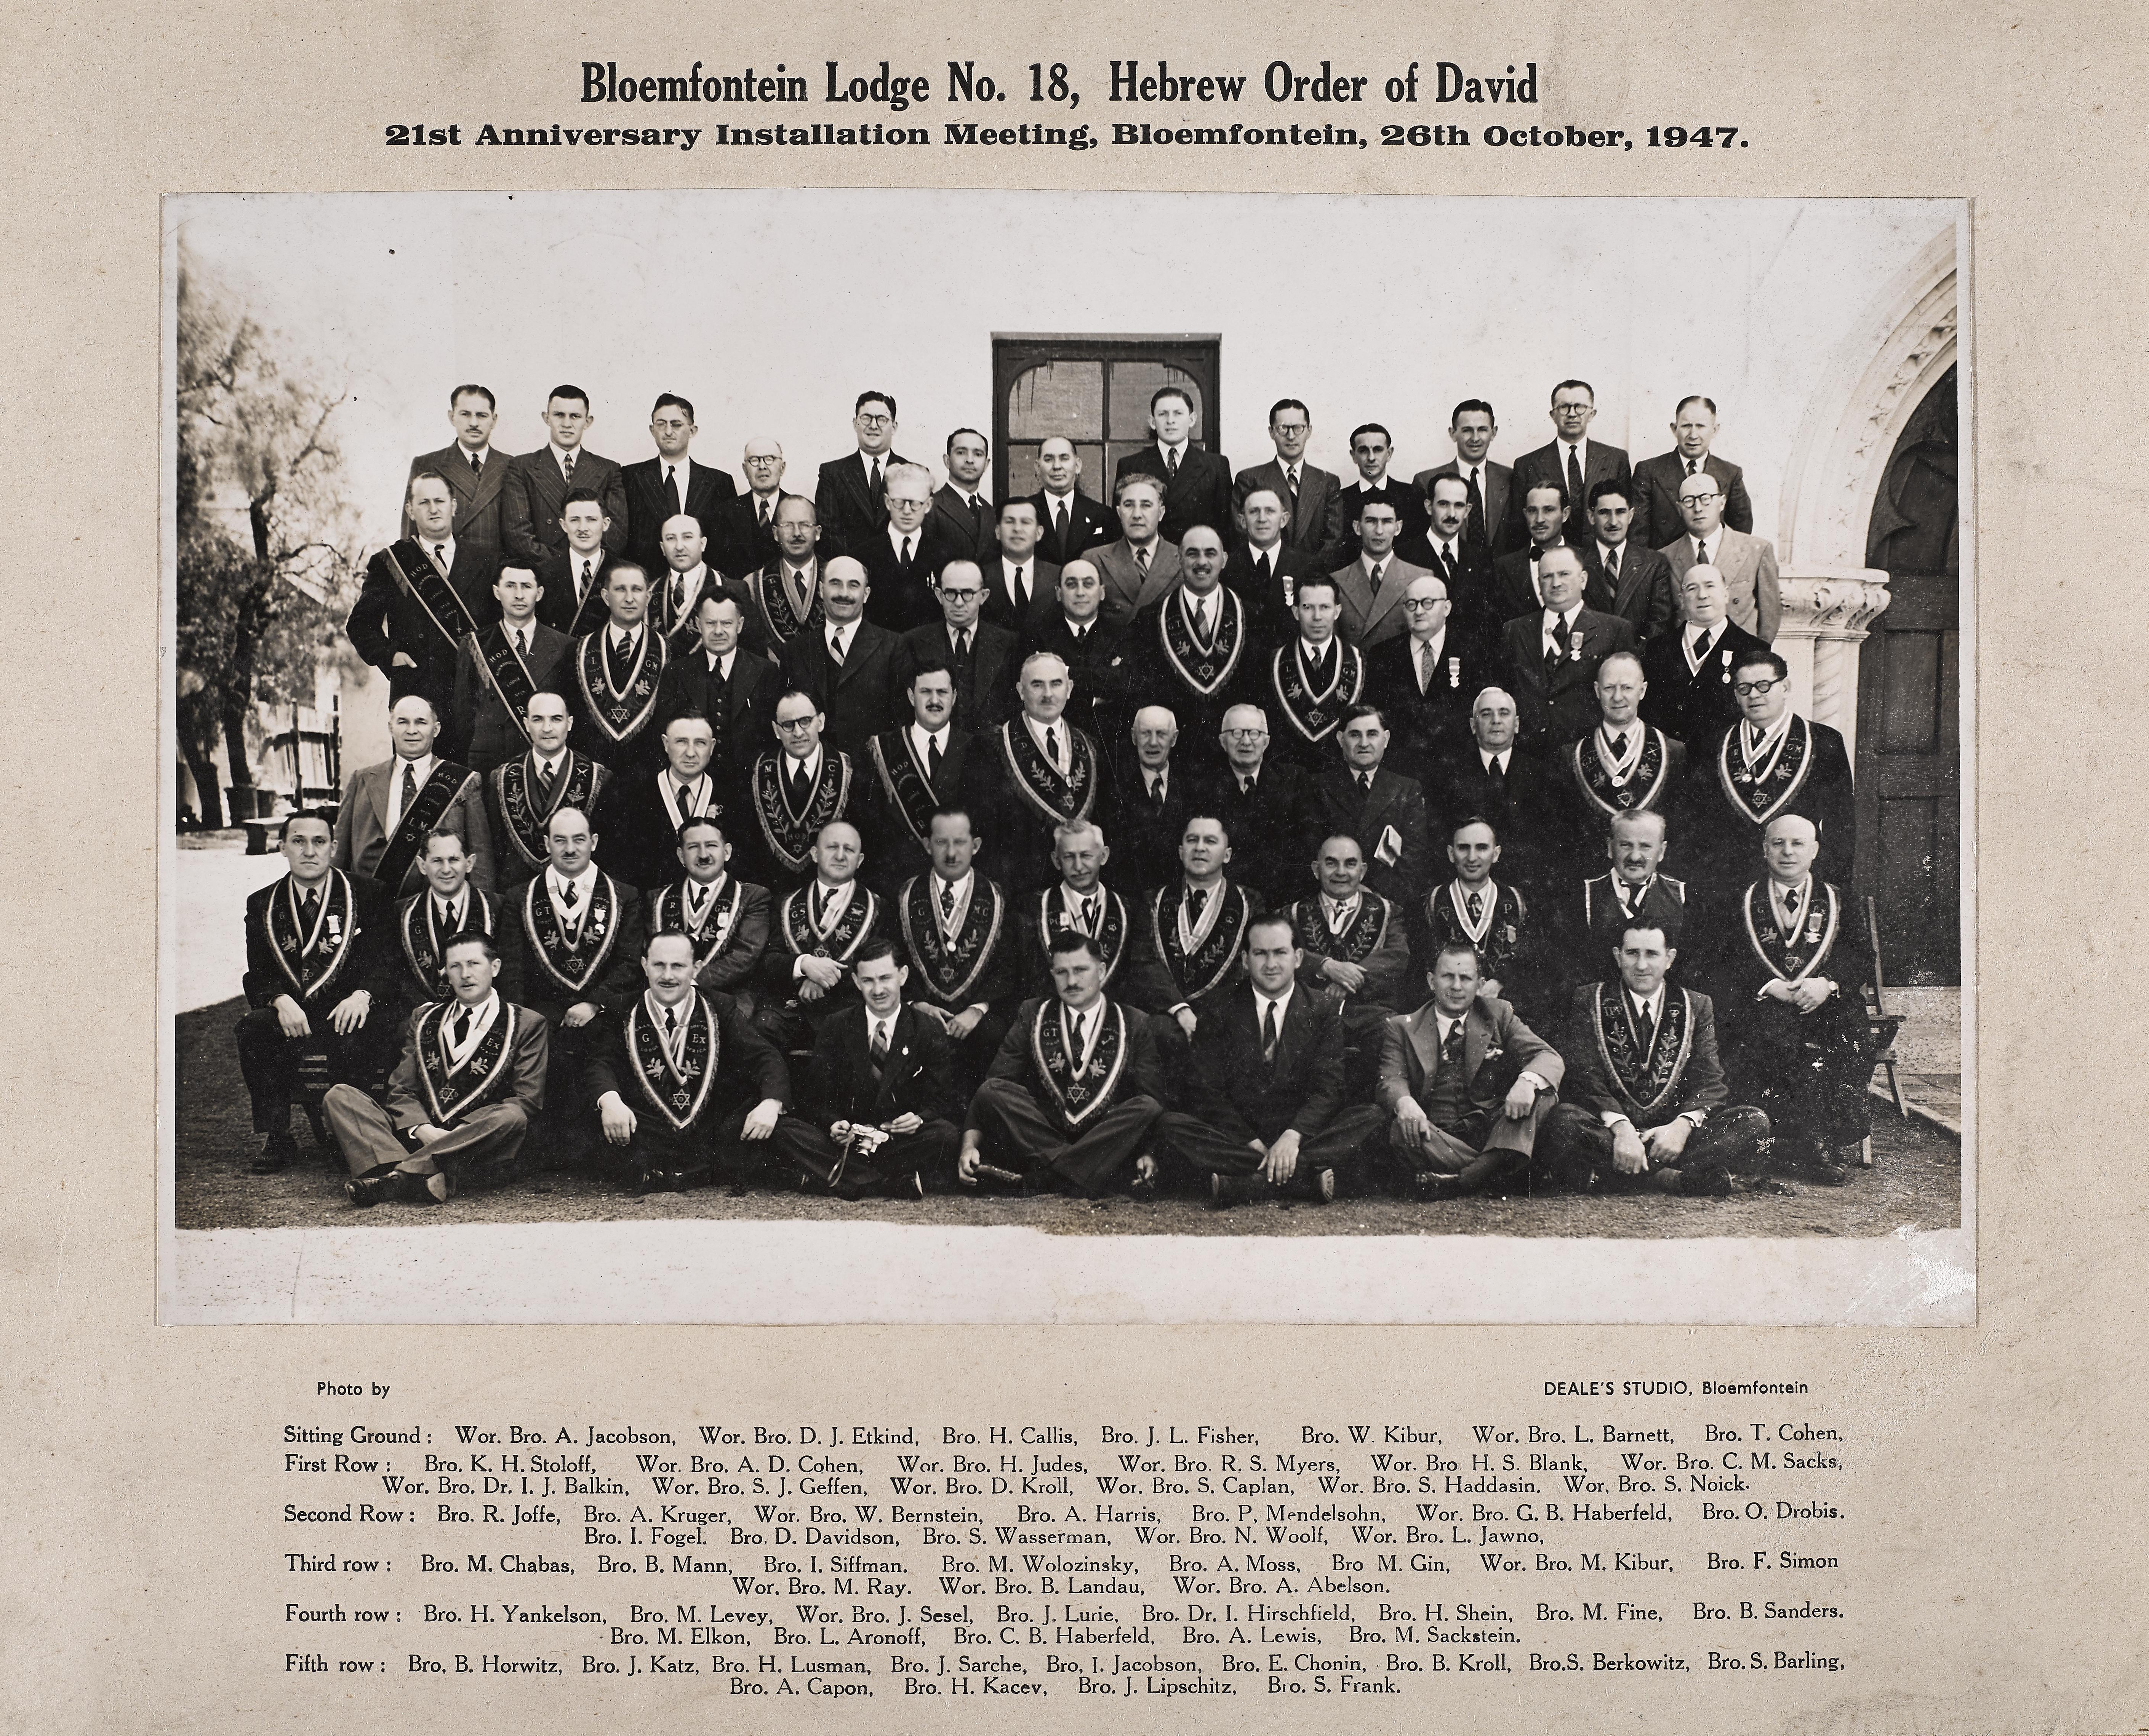 Bloemfontein Lodge 1947